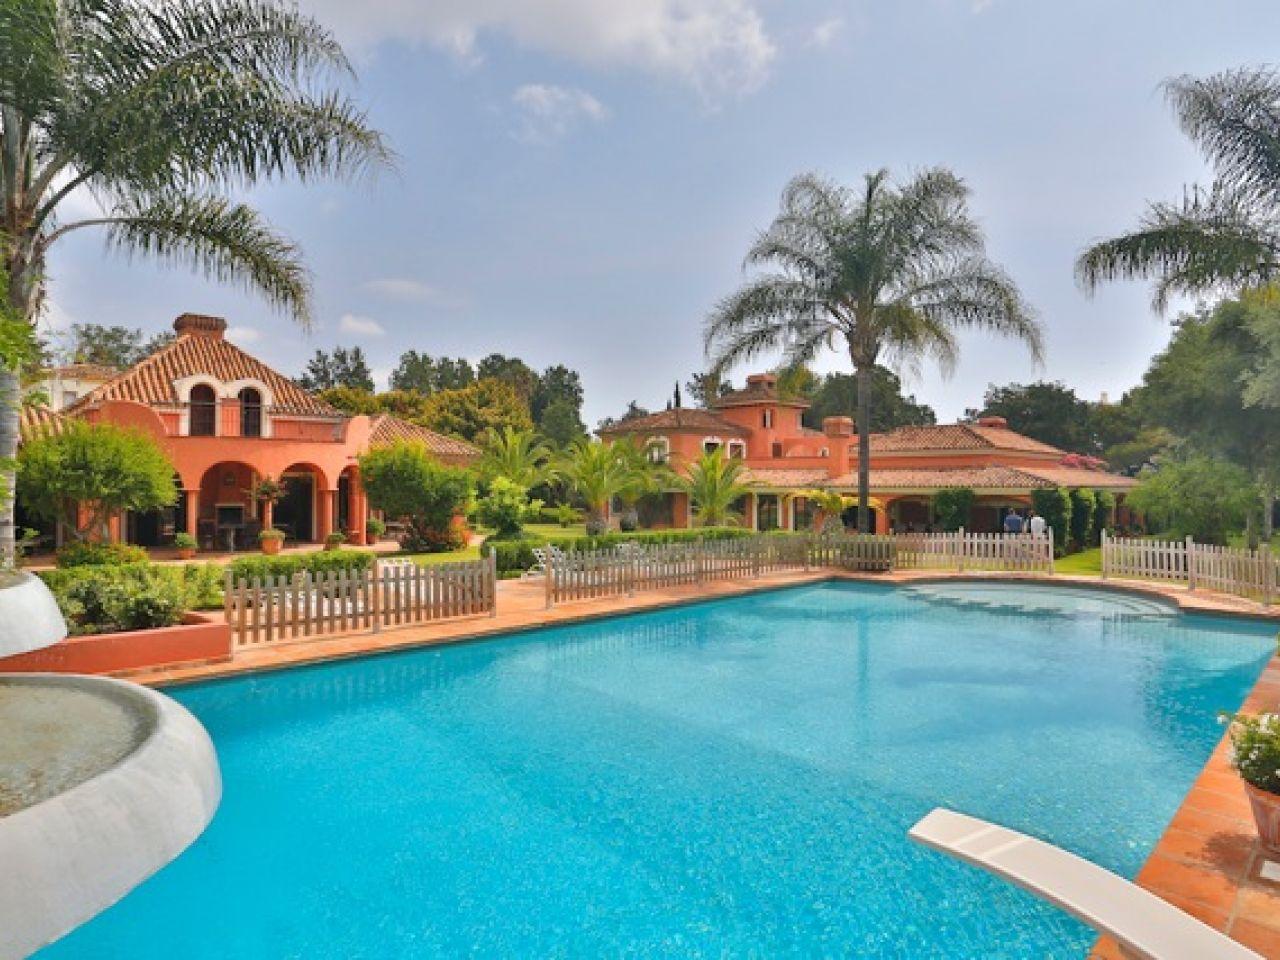 獨棟家庭住宅 為 出售 在 Sotogrande Sotogrande, Costa Del Sol 11310 西班牙